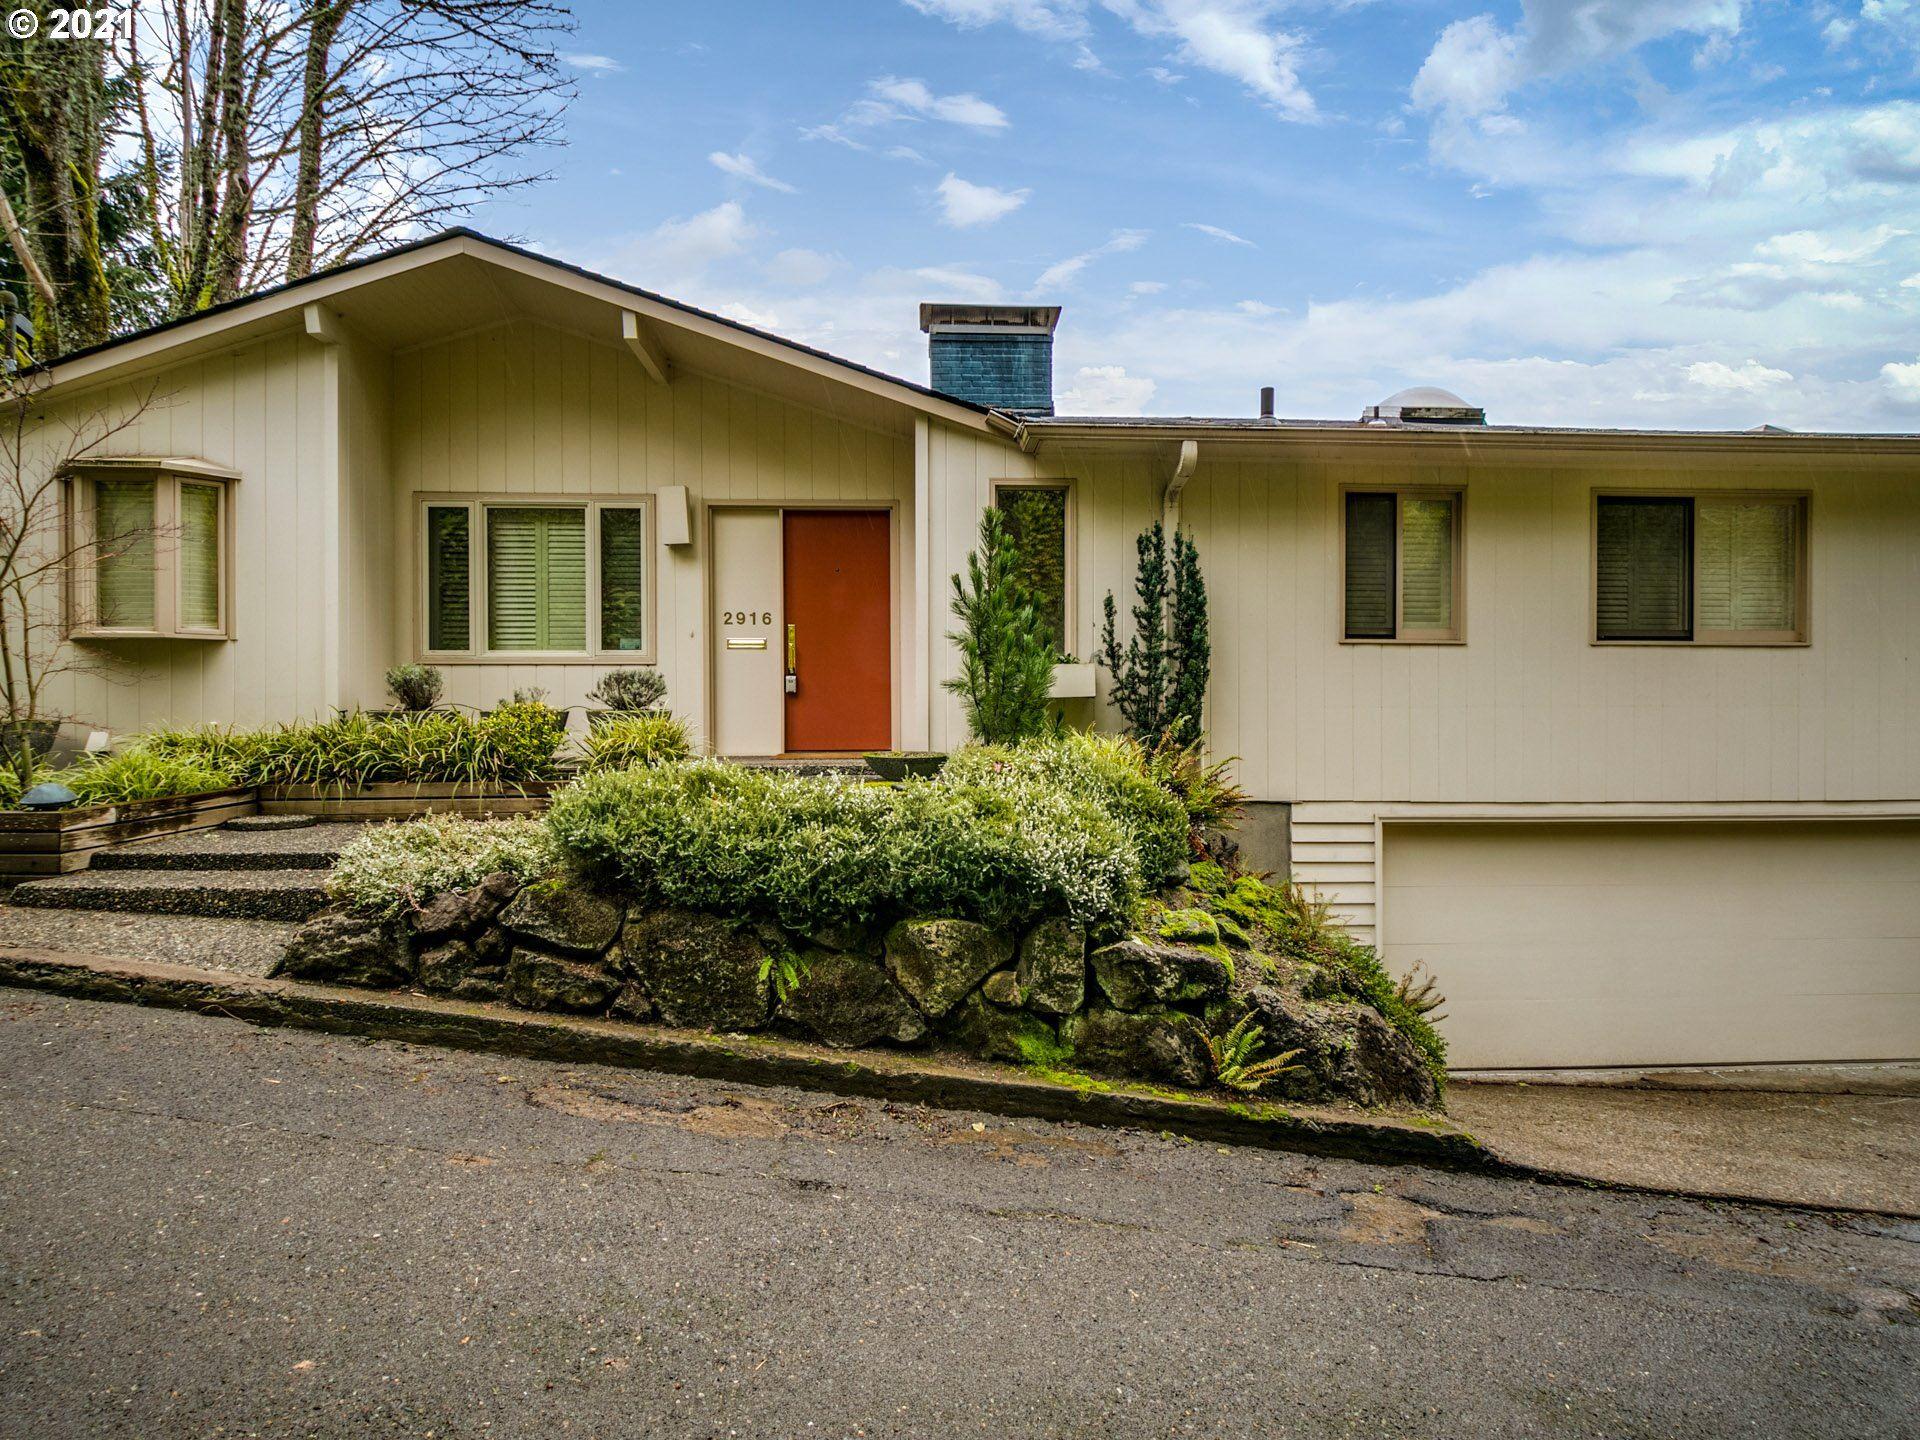 2916 NW Verde Vista TER, Portland, OR 97210 - MLS#: 20399395